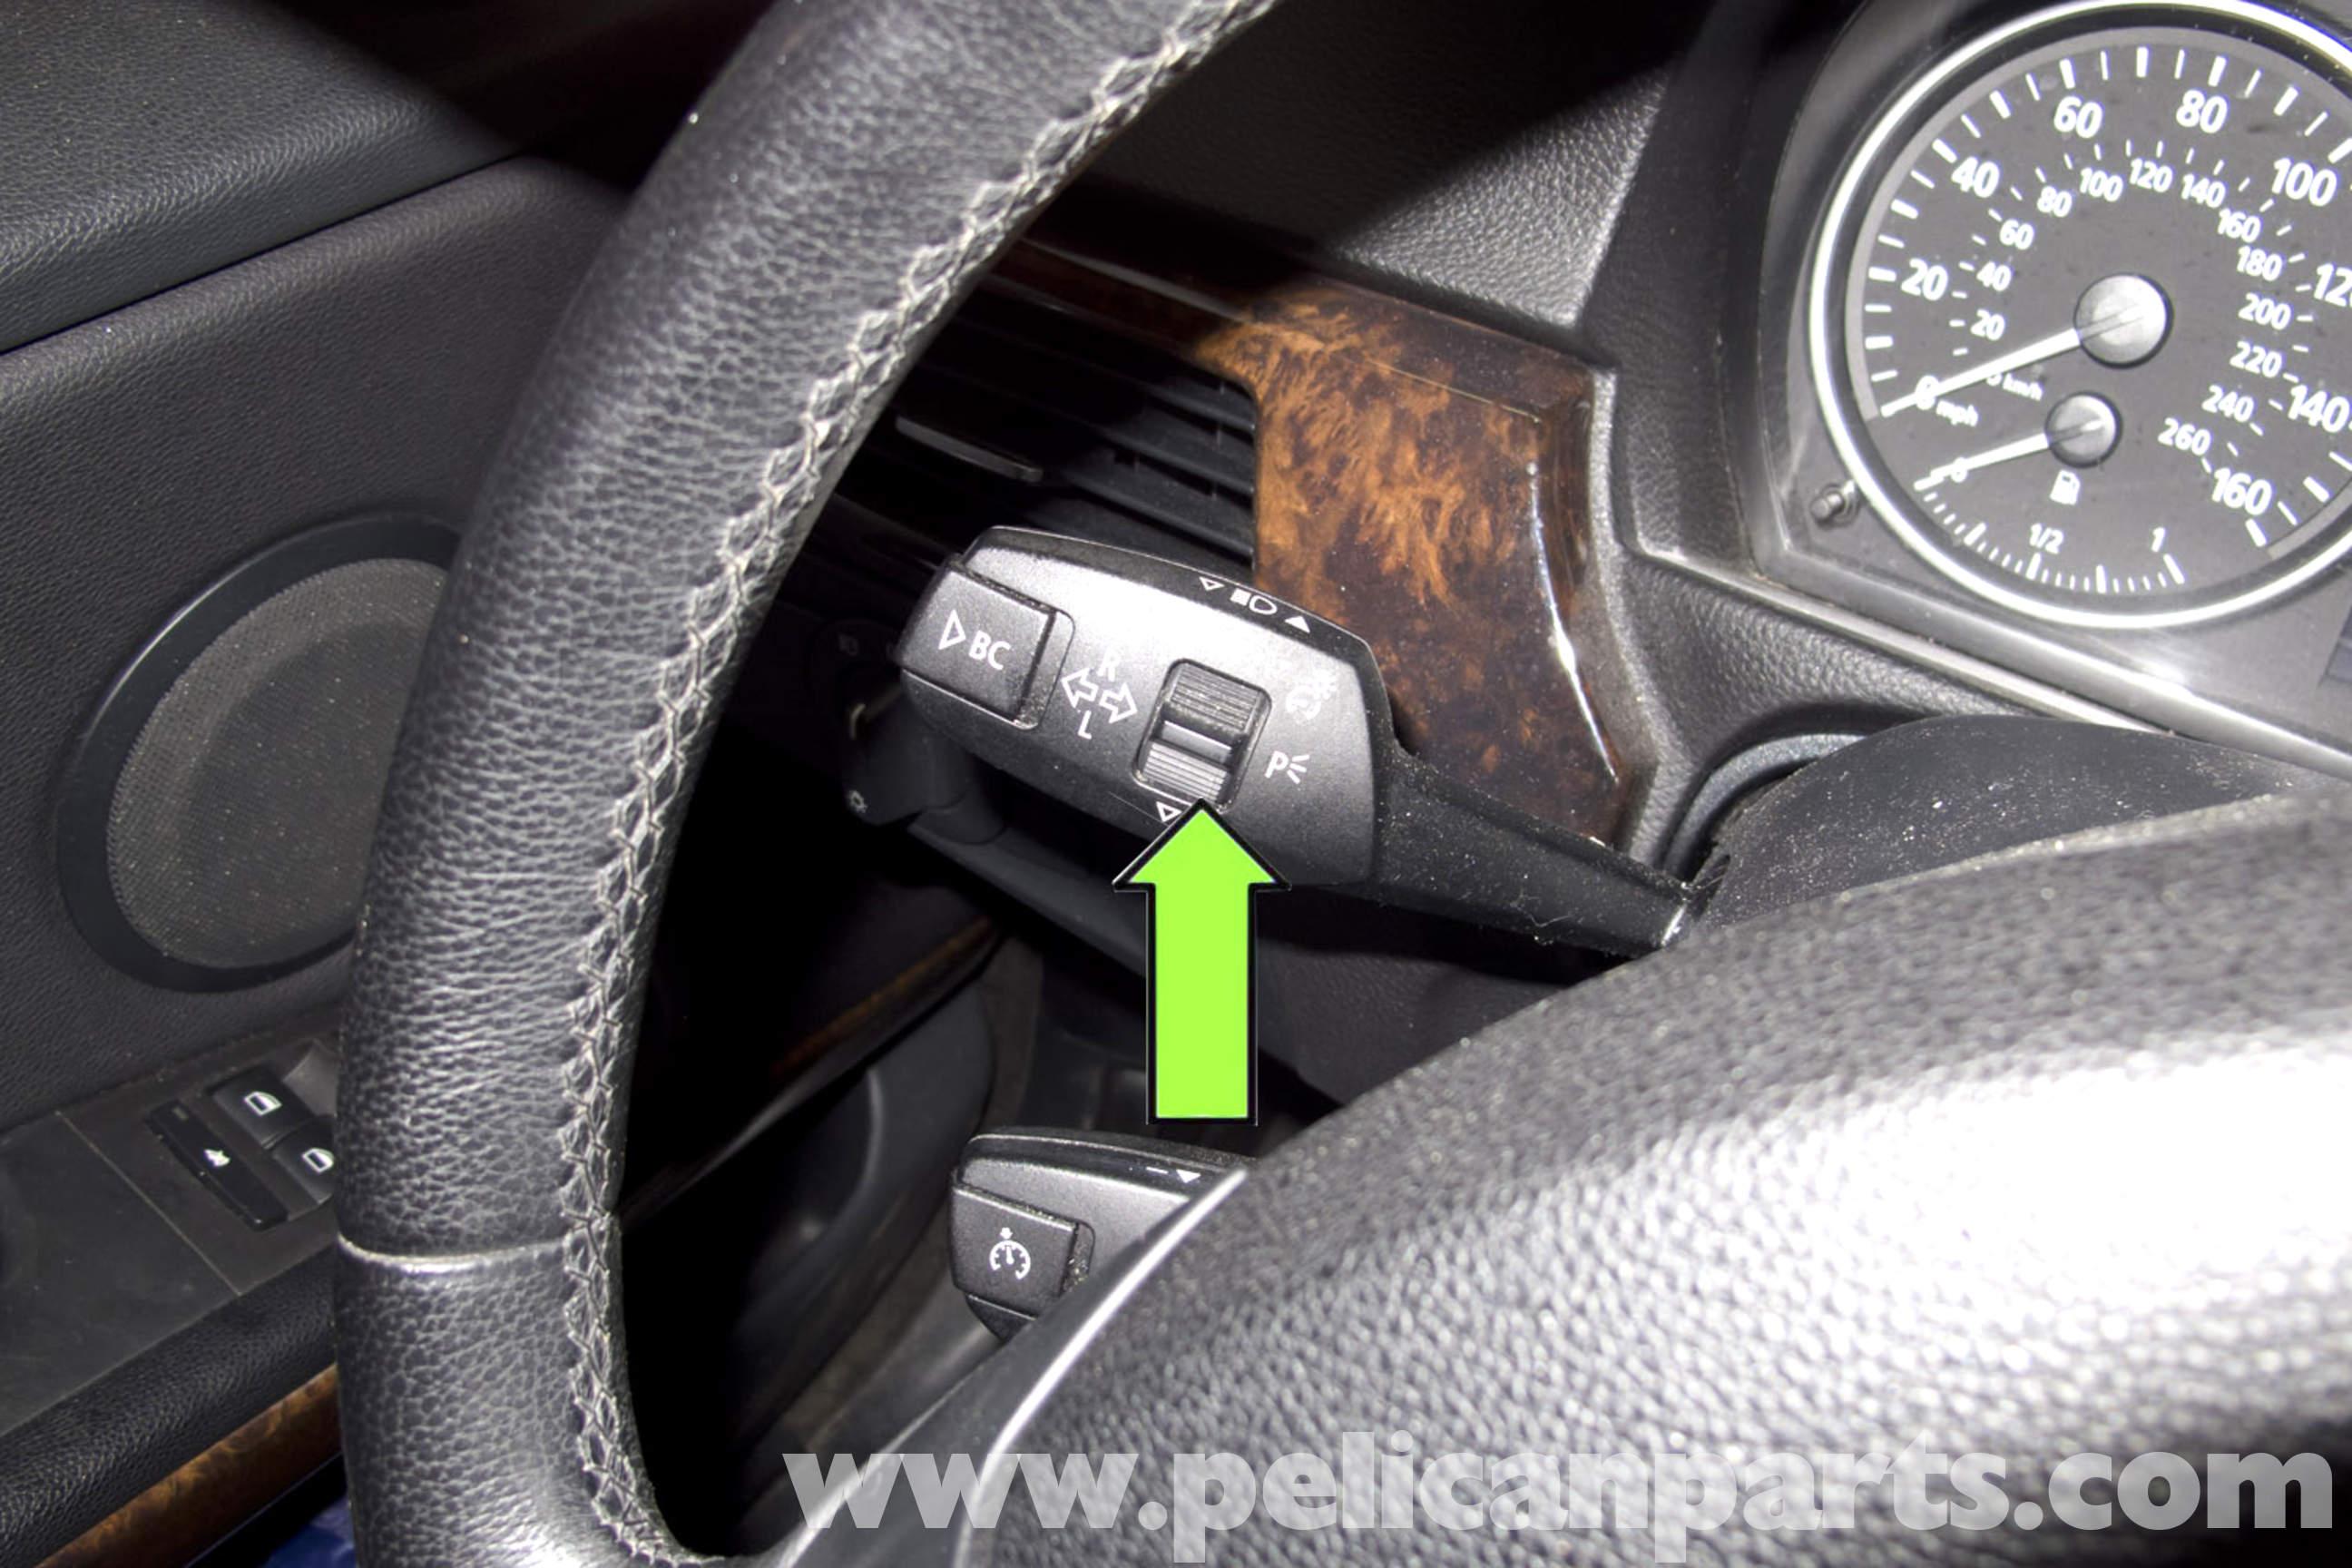 1996 Gmc Pickup Fuel Pump Wiring Diagram Bmw E90 Tire Pressure Warning Light Reset E91 E92 E93